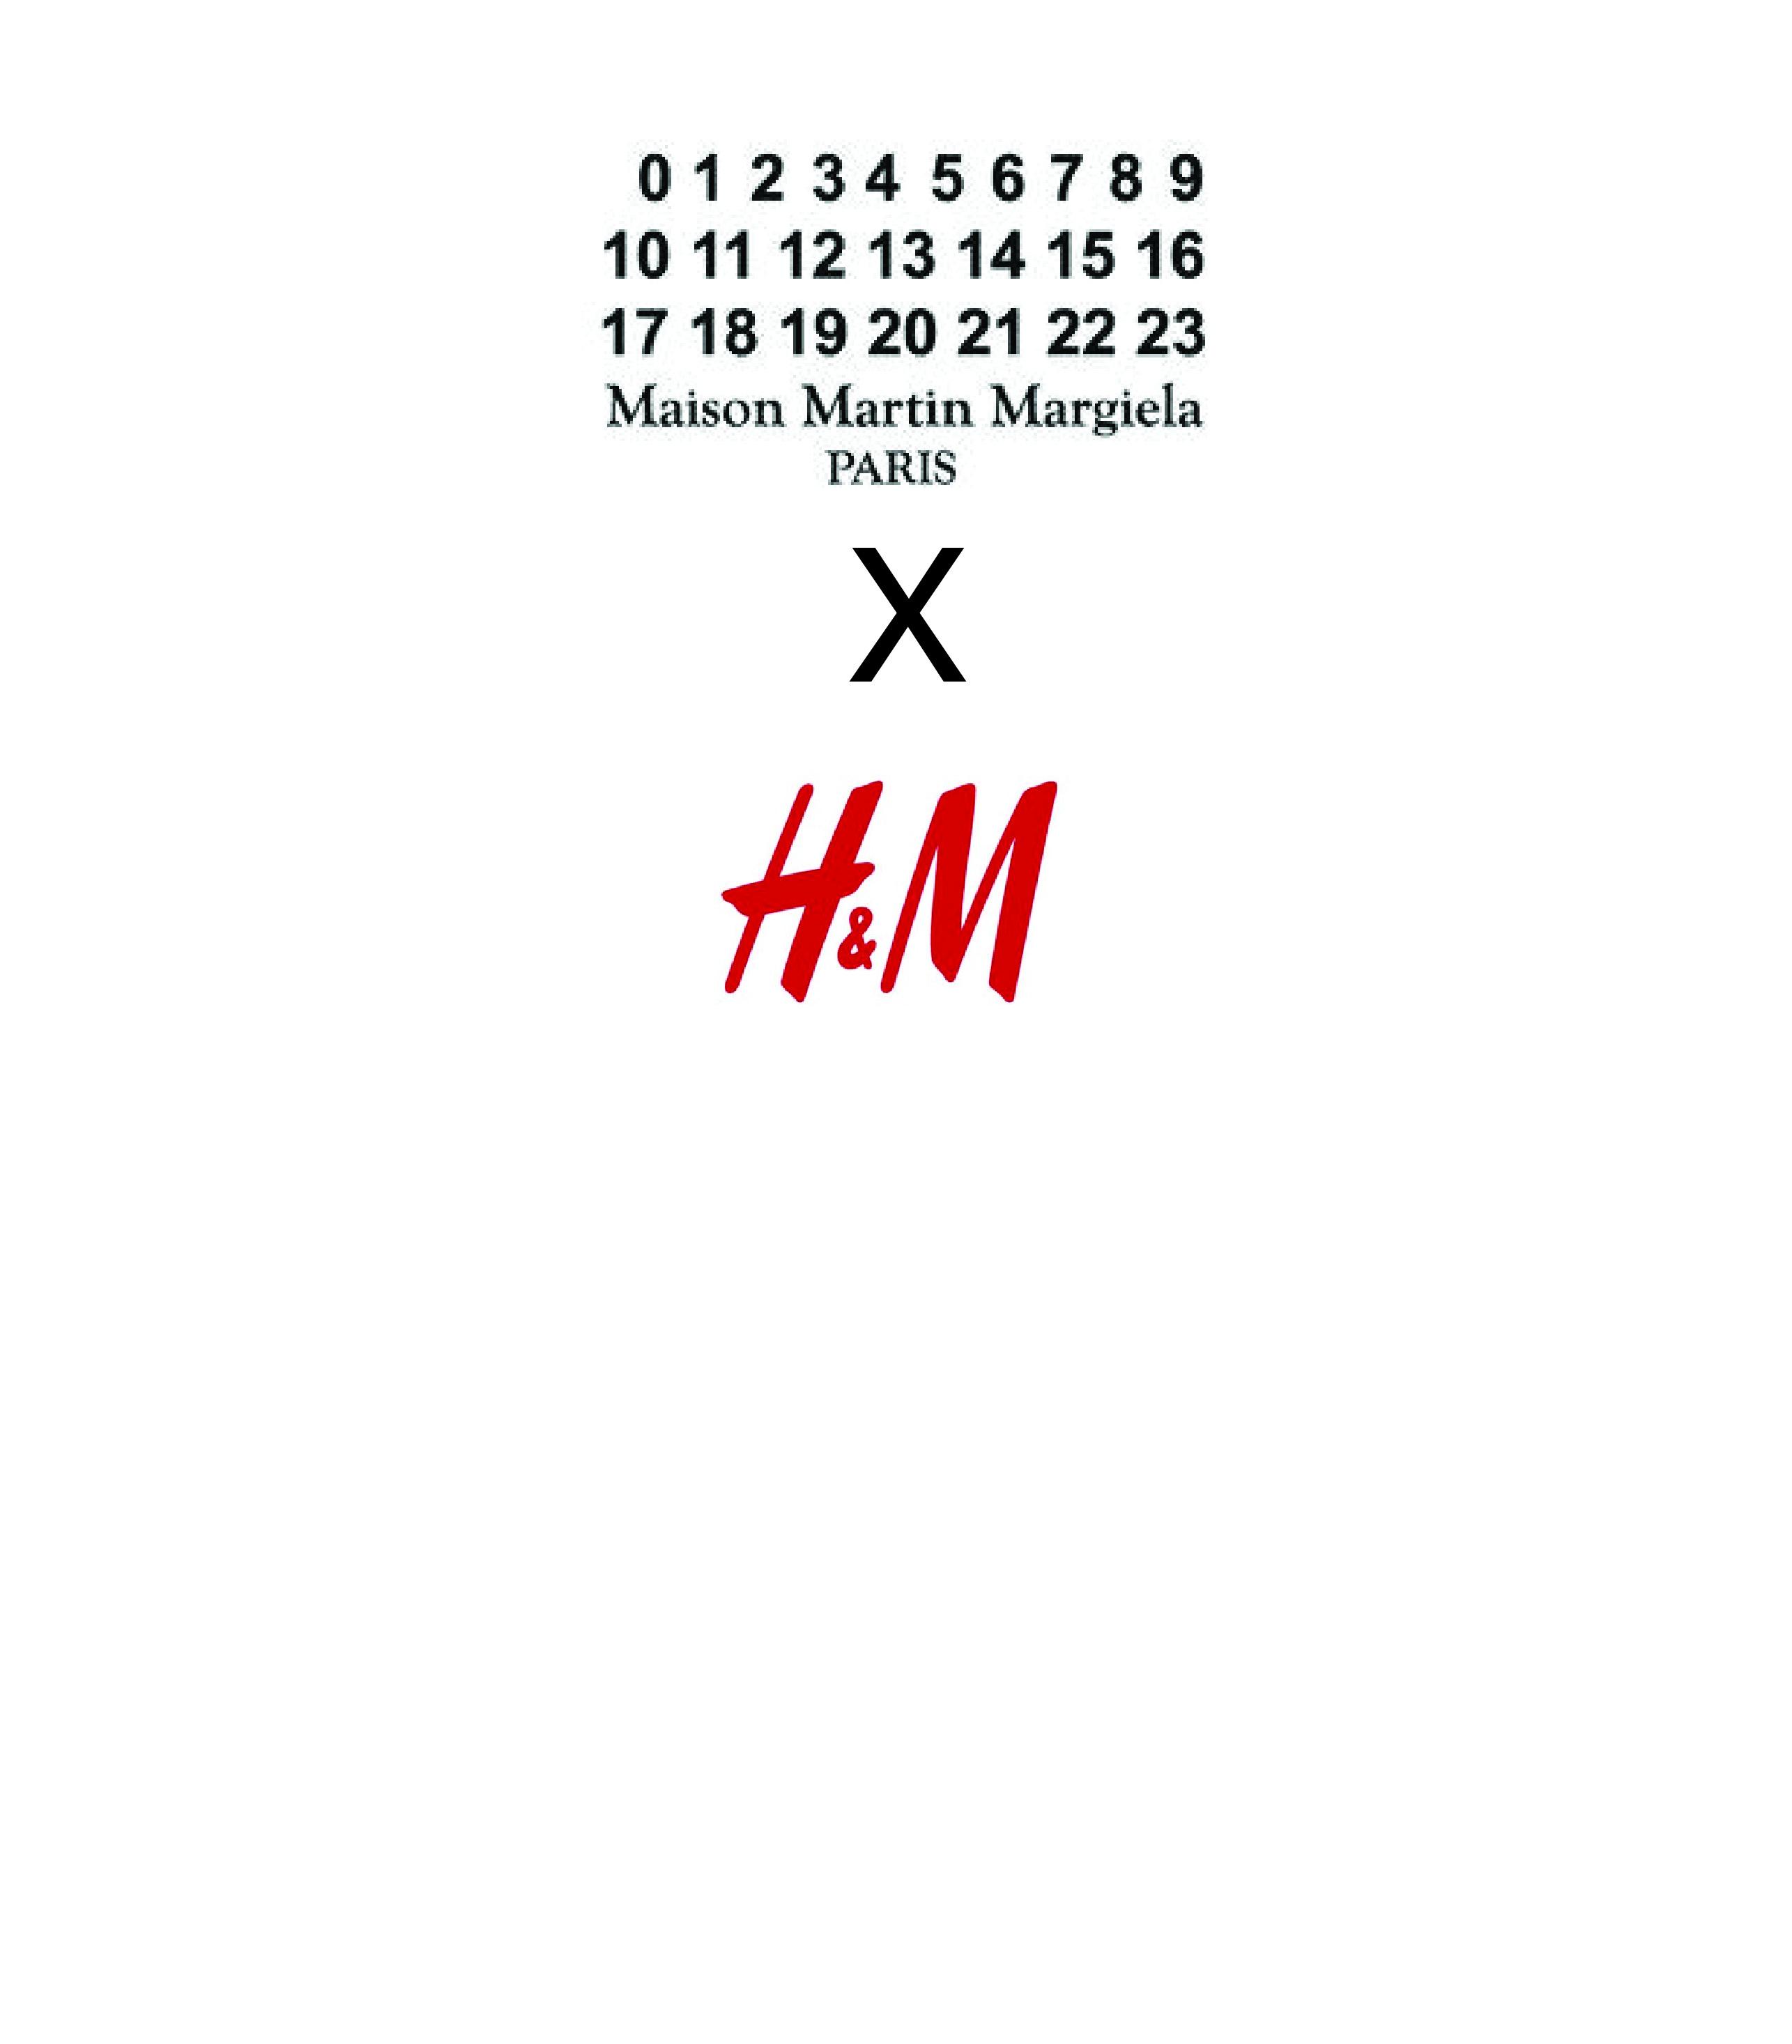 official photos 5ea34 85121 H&M X Maison Martin Margiela | Fashionartisan's Blog